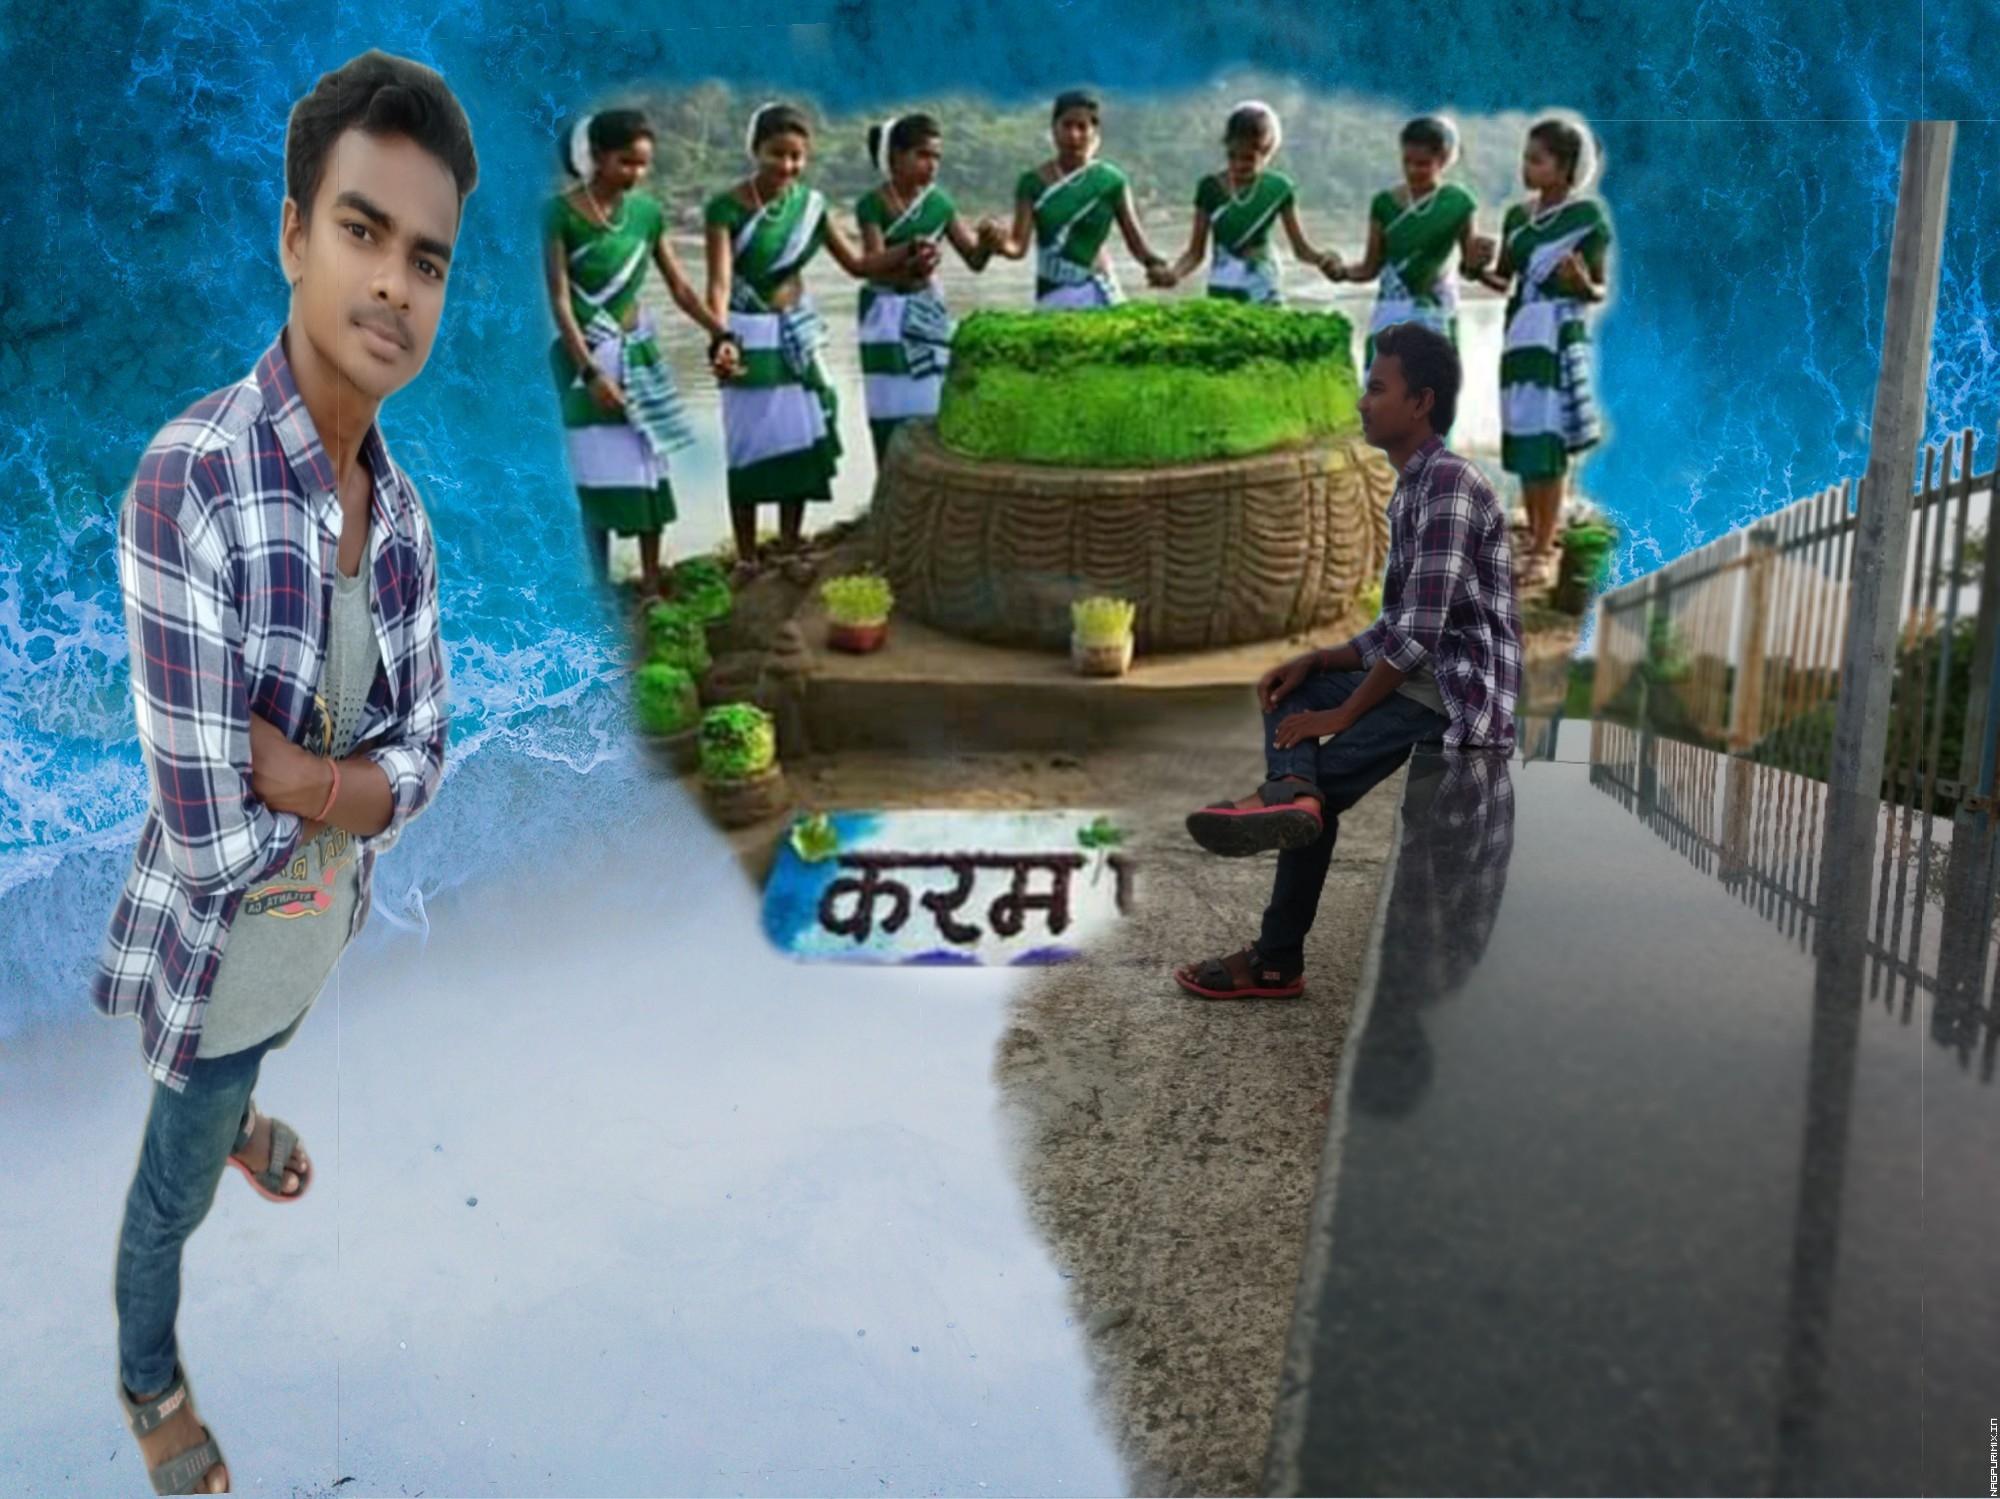 Jhakan Jhakan Chalis La Danda Lagkay  Dil Mor Dharak Dharak Jay Singer_Mr Dhanesh New Nagpuri song .mp3